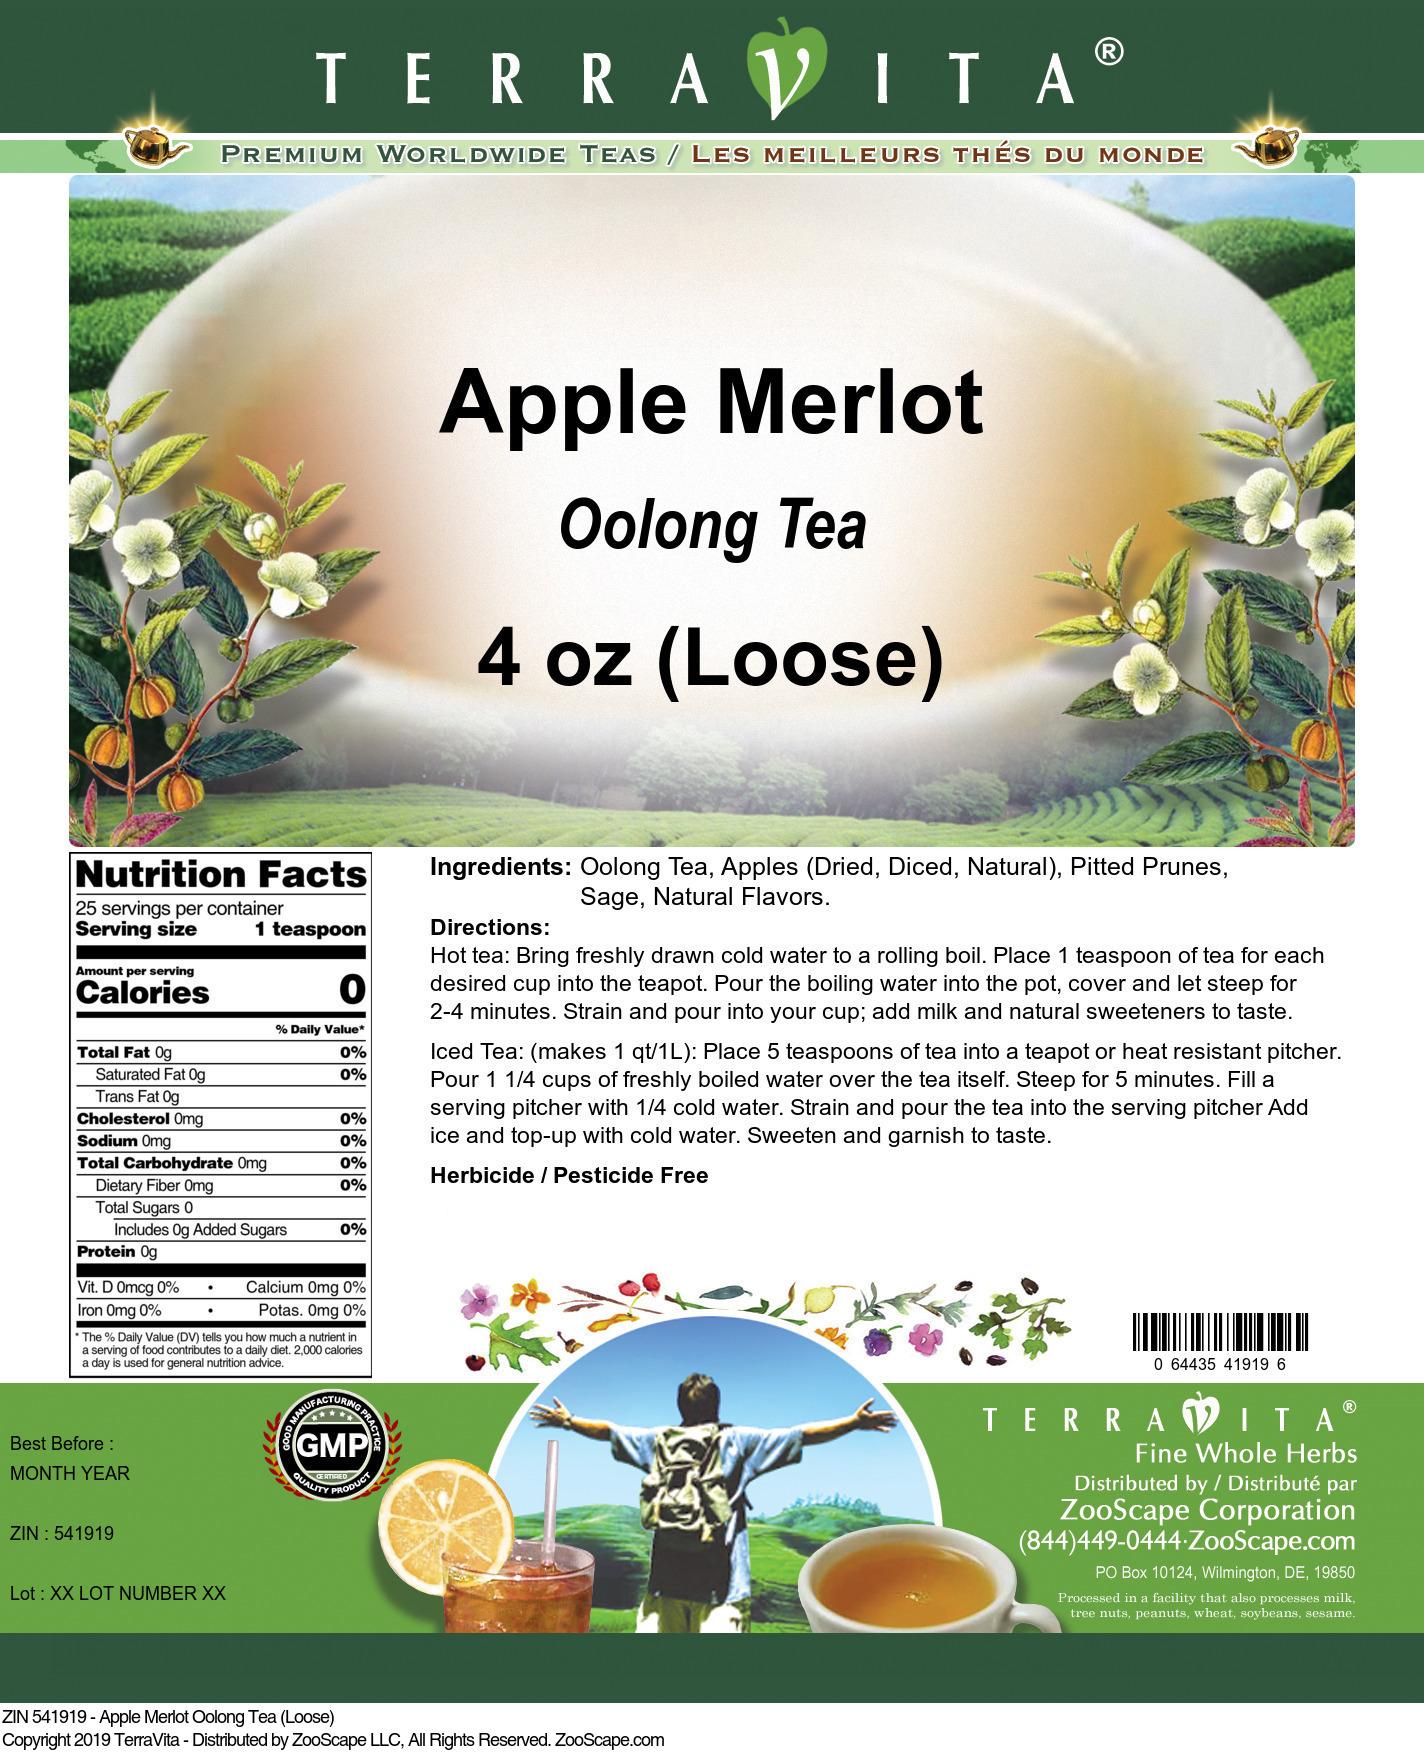 Apple Merlot Oolong Tea (Loose)